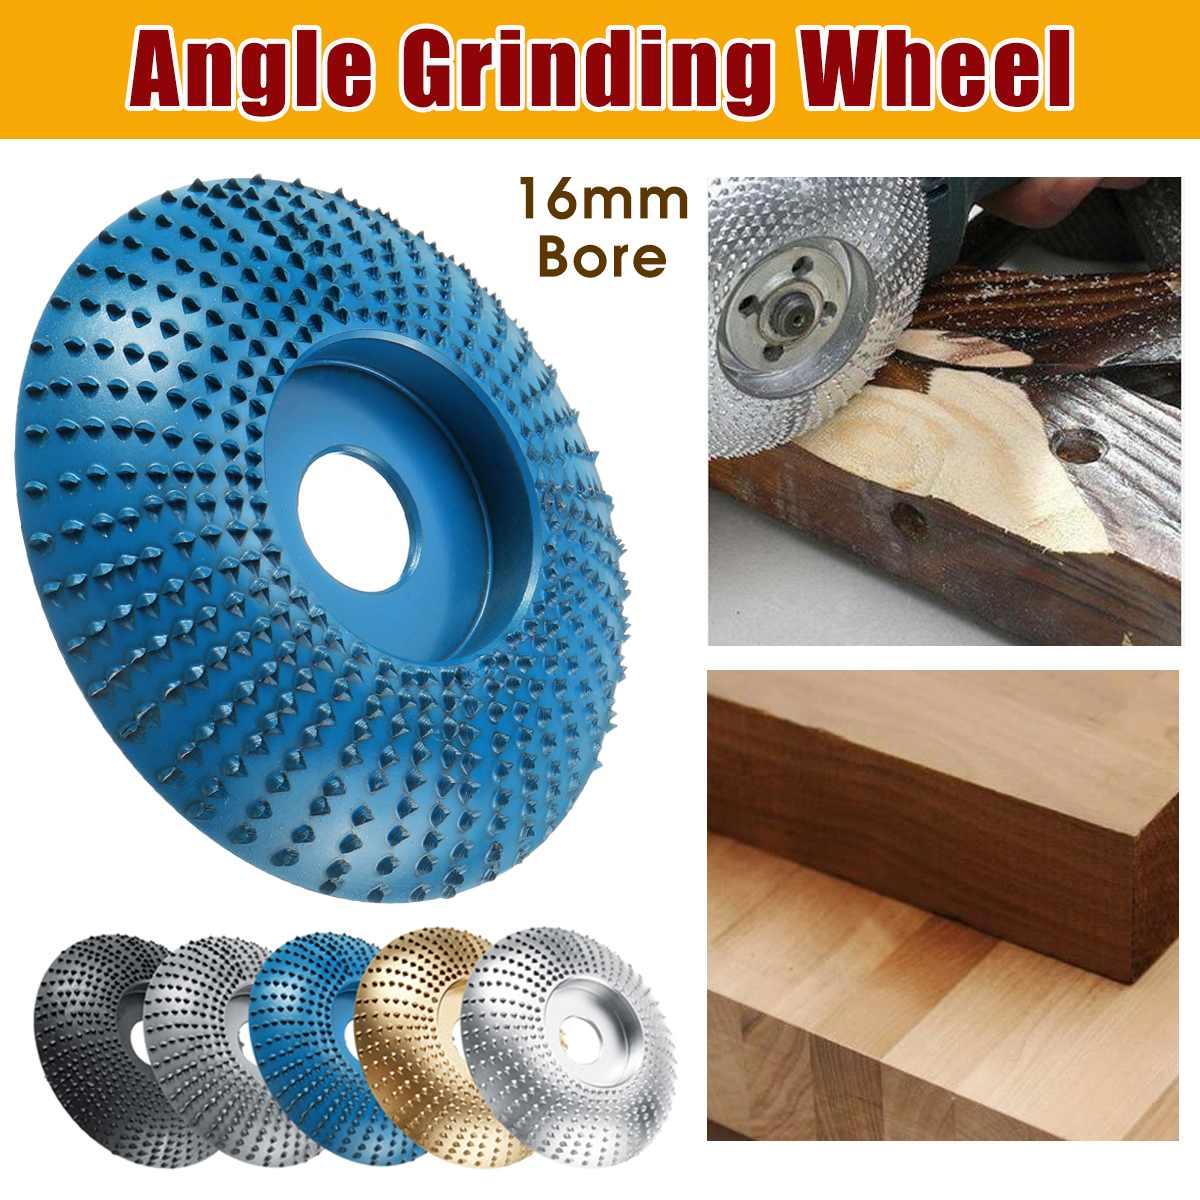 84mm de diámetro 16mm de diámetro molinillo de madera molinillo angular disco lijado tallado herramienta abrasiva para molinillo angular molinillo